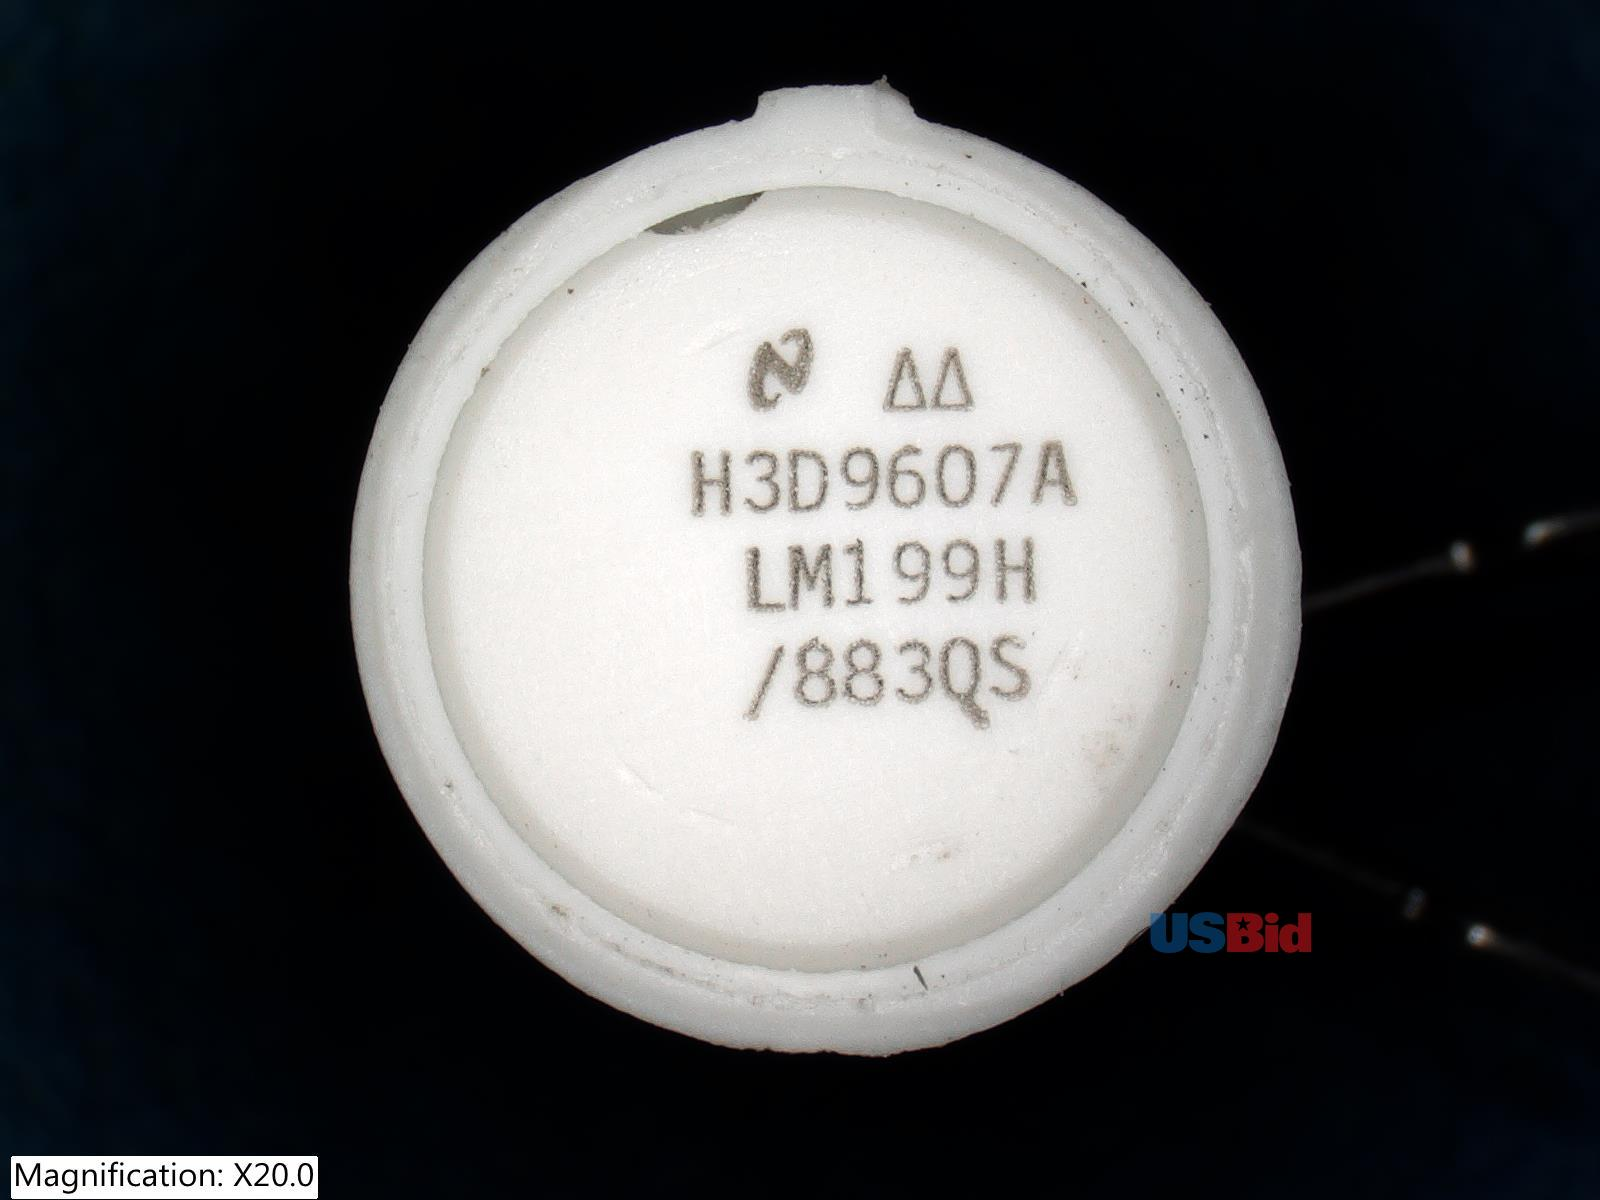 LM199H/883 photos